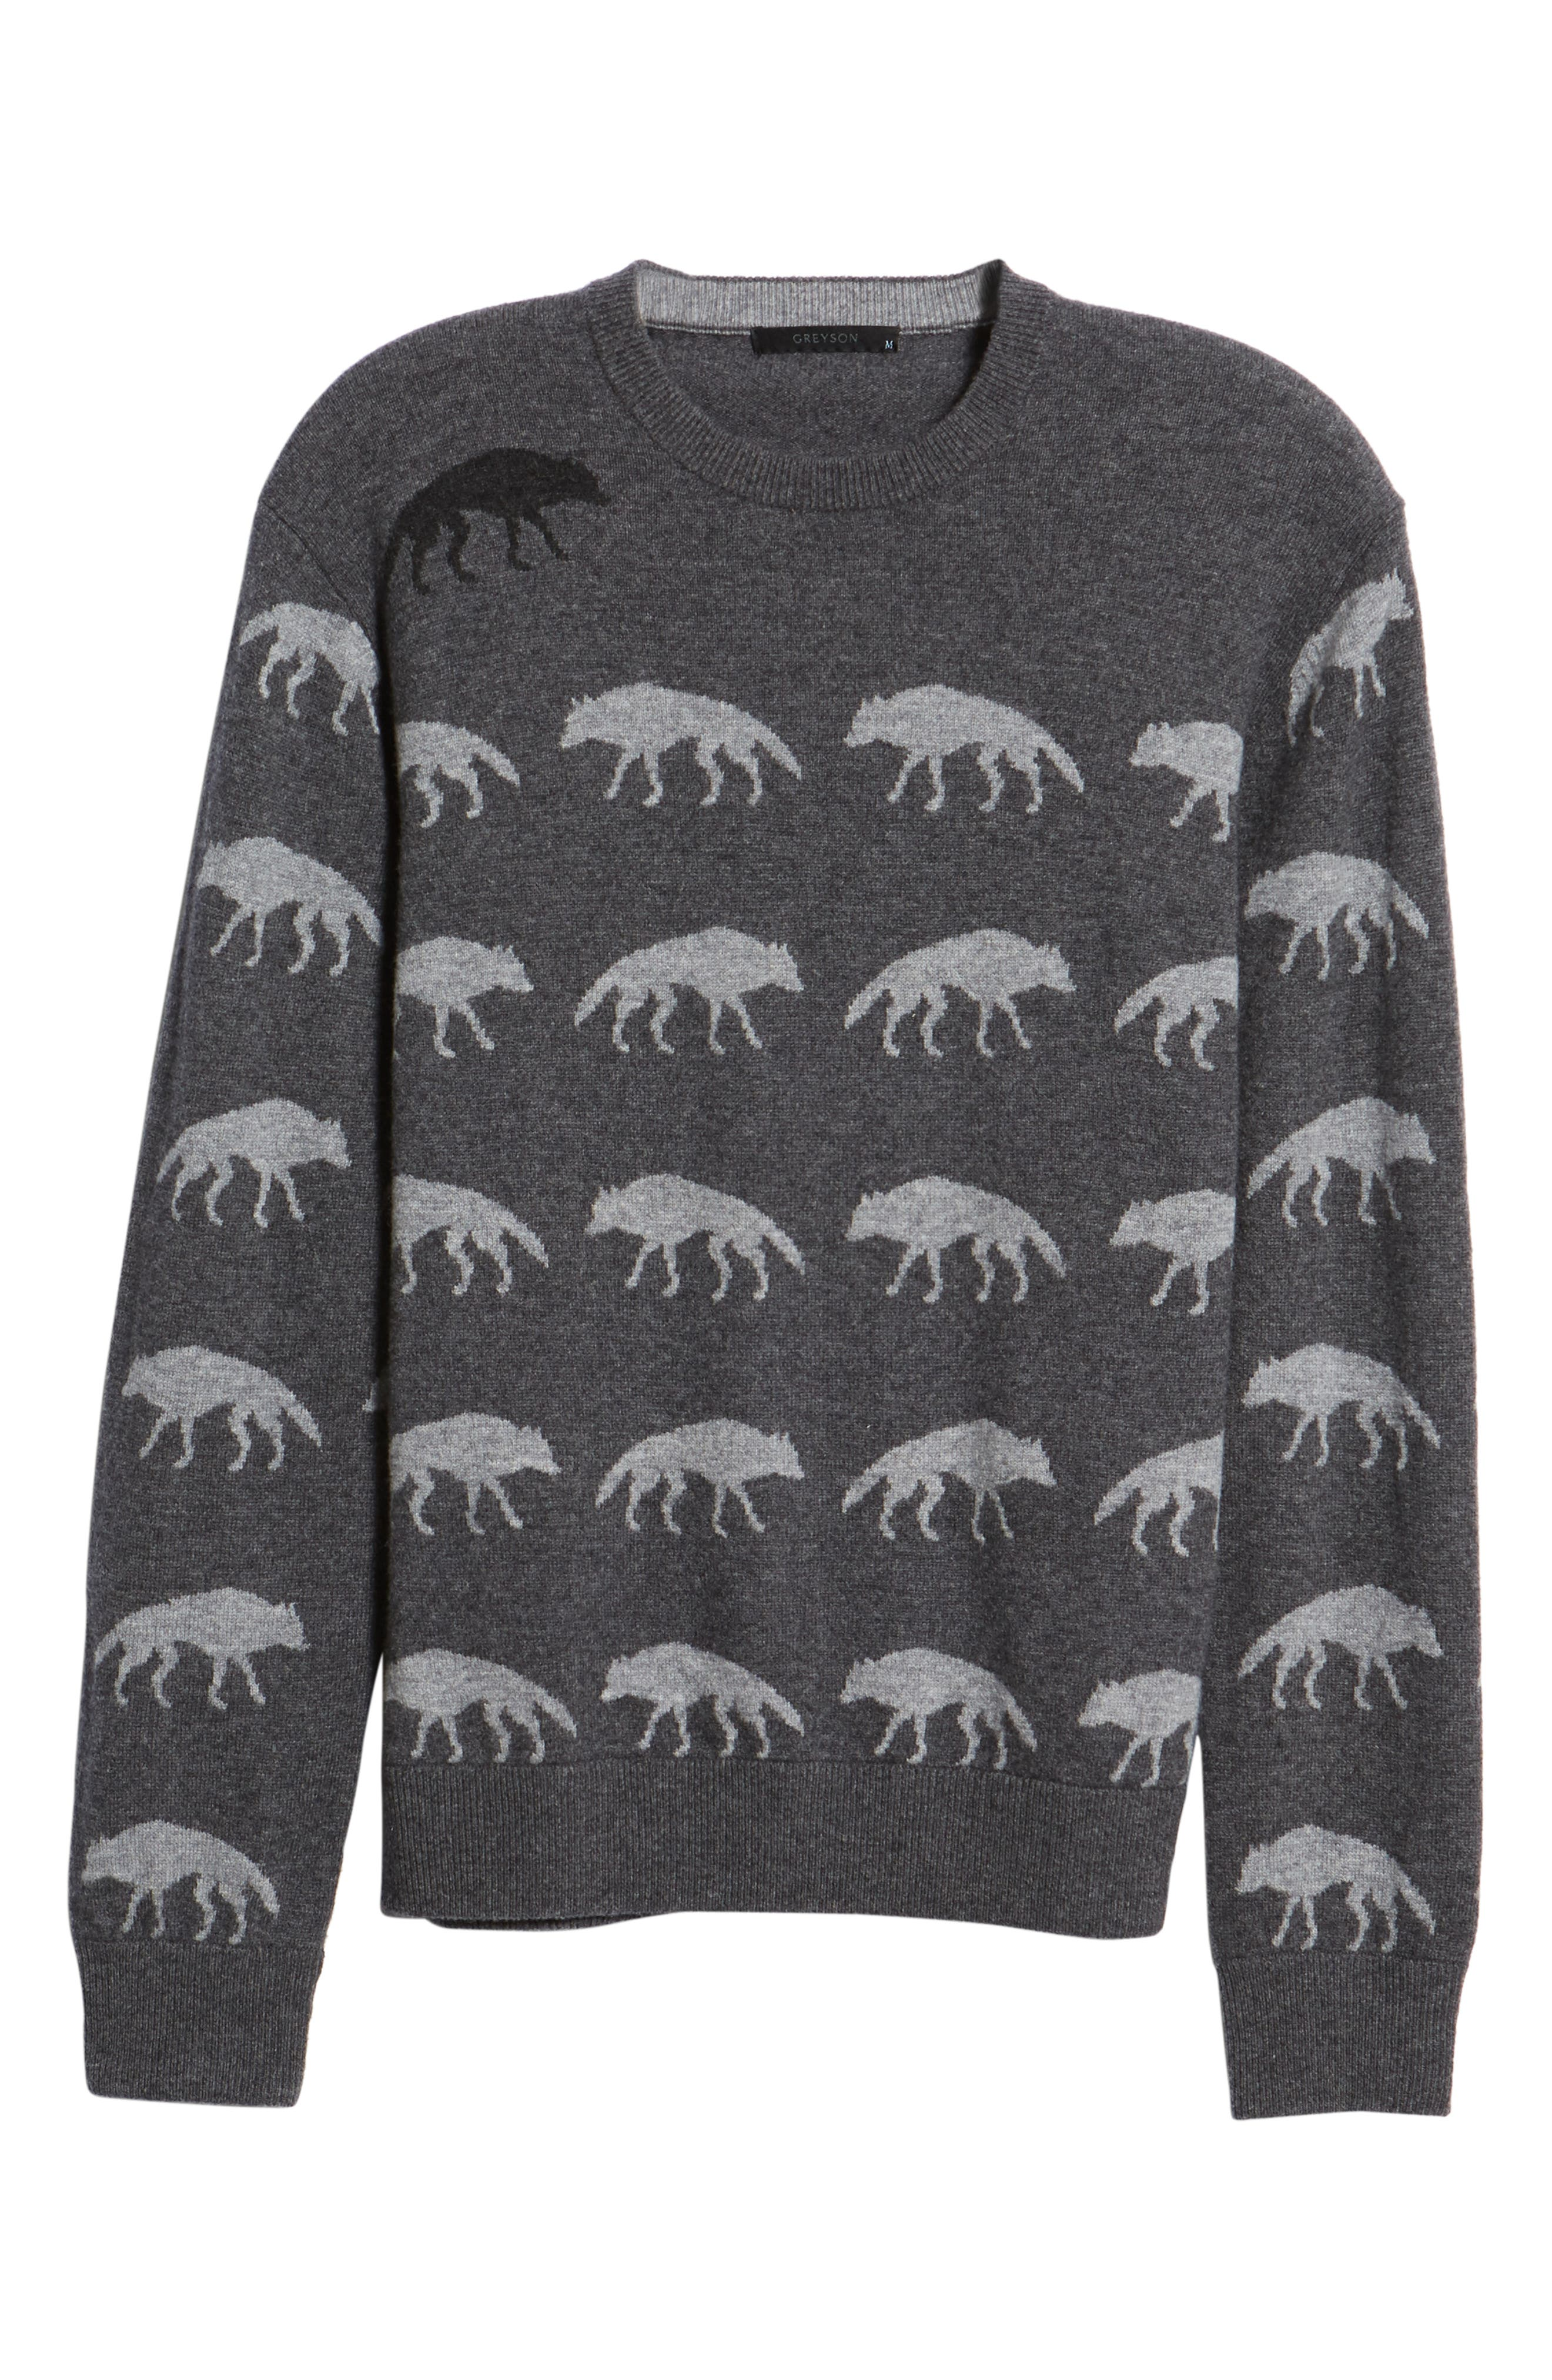 Alphawolf Intarsia Crewneck Sweater,                             Alternate thumbnail 6, color,                             GREY HEATHER